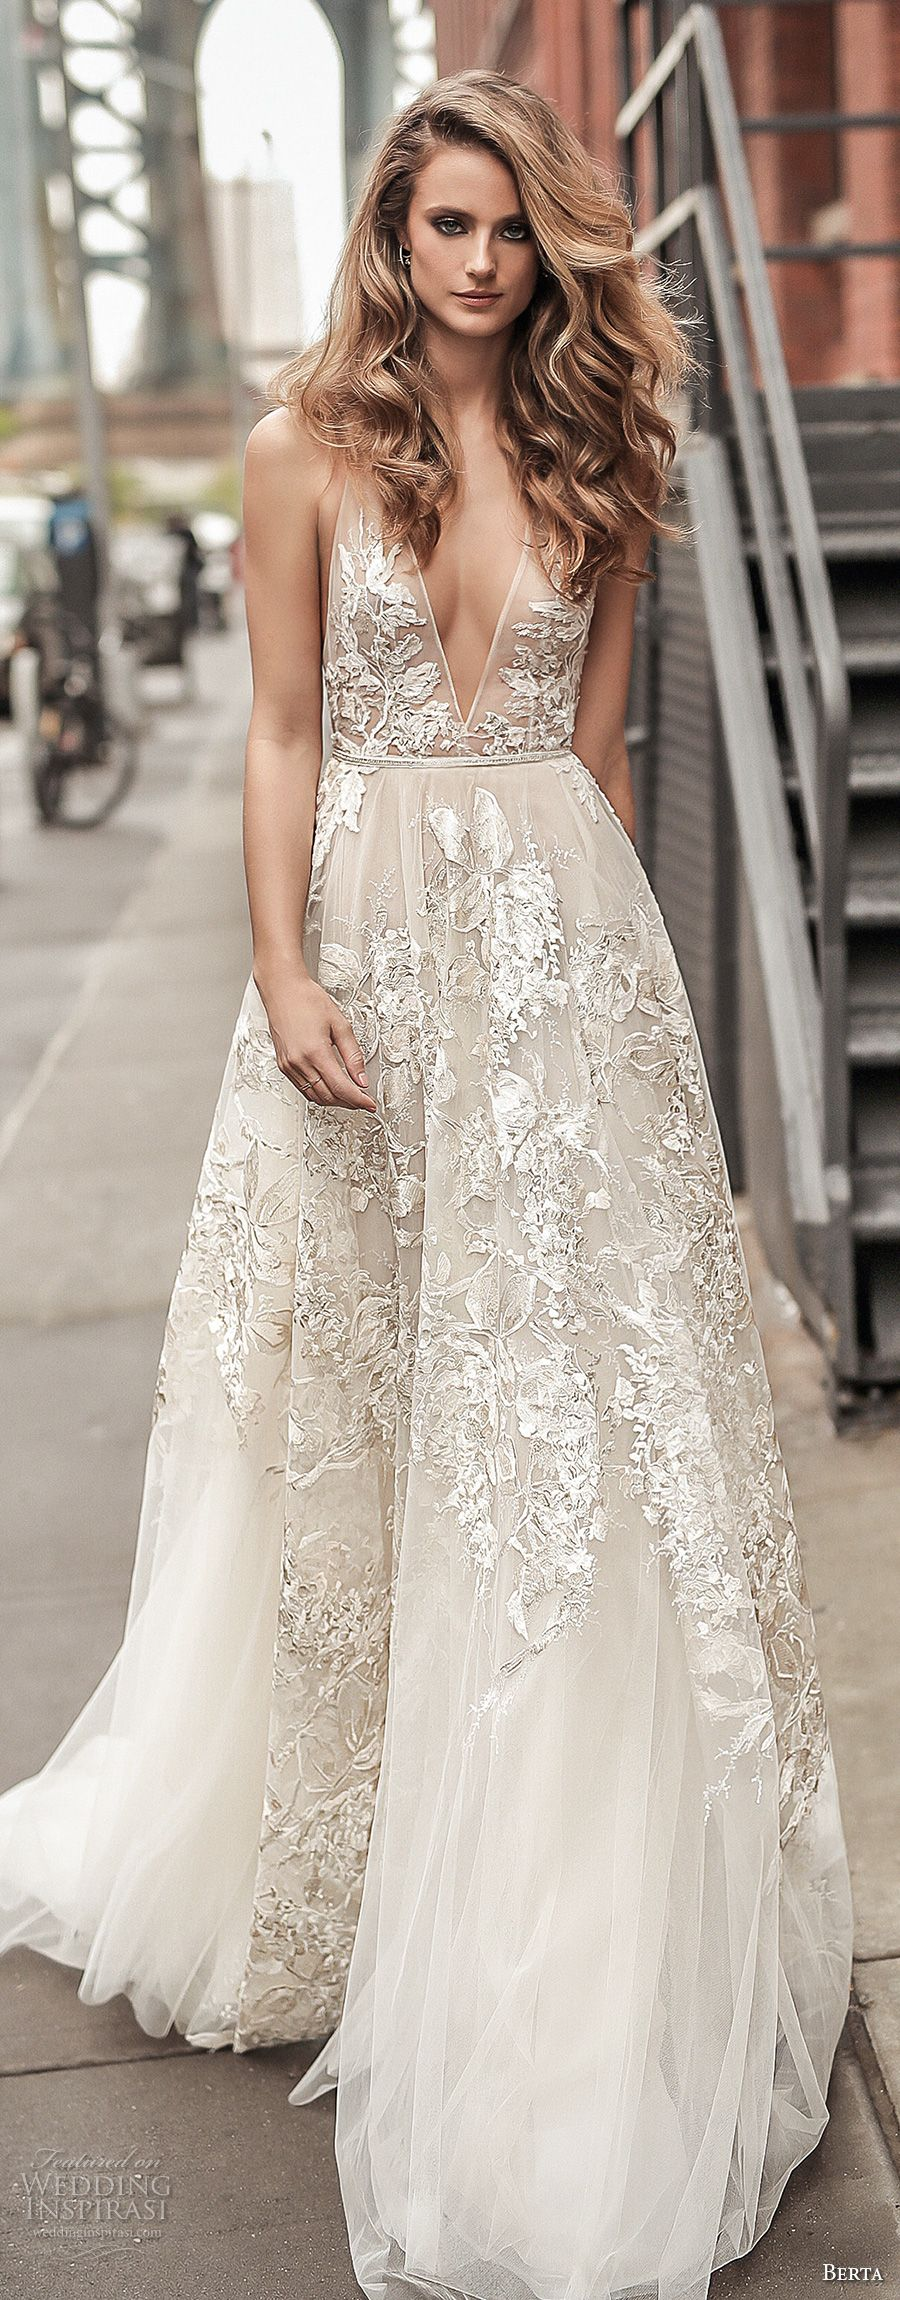 d5eac8d3784 Berta Spring 2018 Bridal Spaghetti Strap Deep Plunging V Neck Full  Embellishment Sexy Romantic A Line